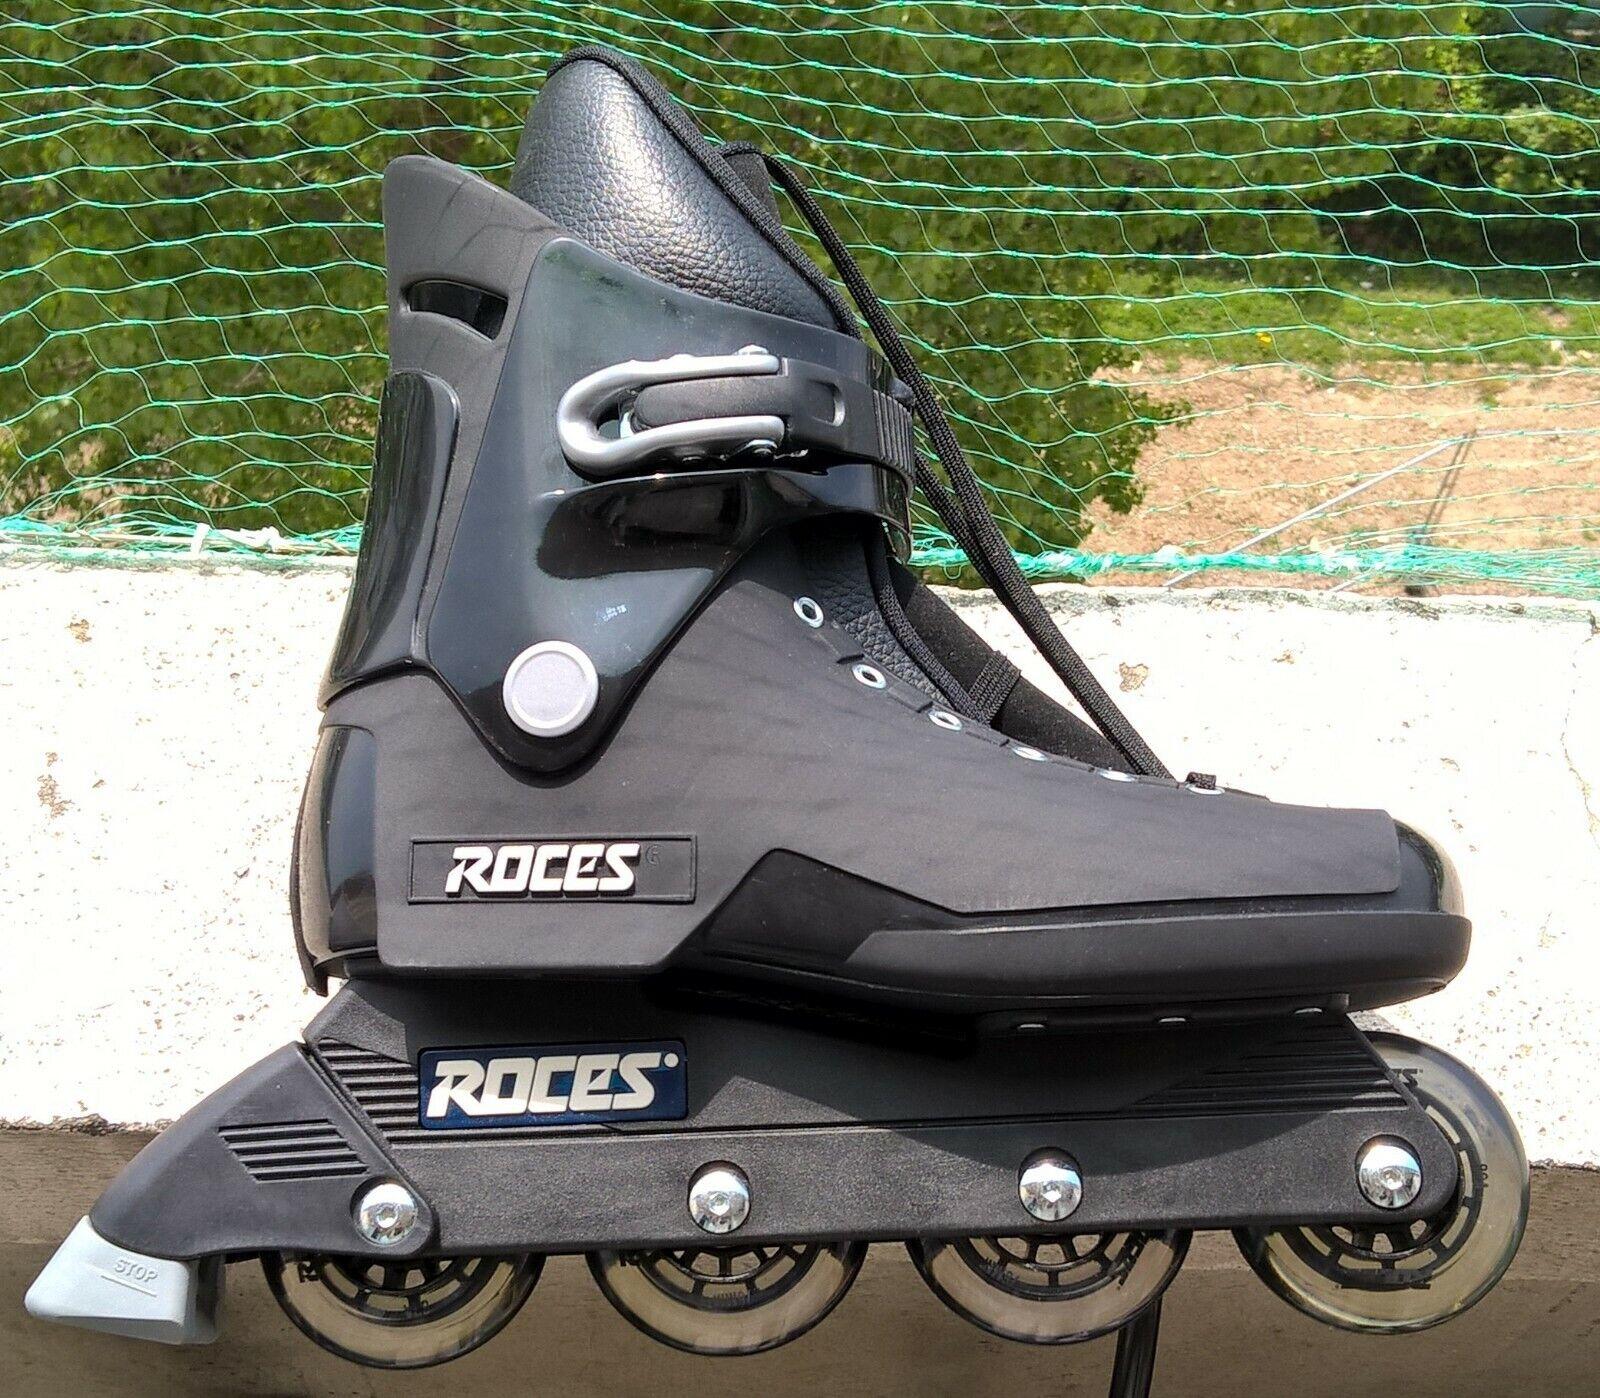 Rollers en ligne Roces FCO - Größe 44 - comme neuf - Farbe schwarz